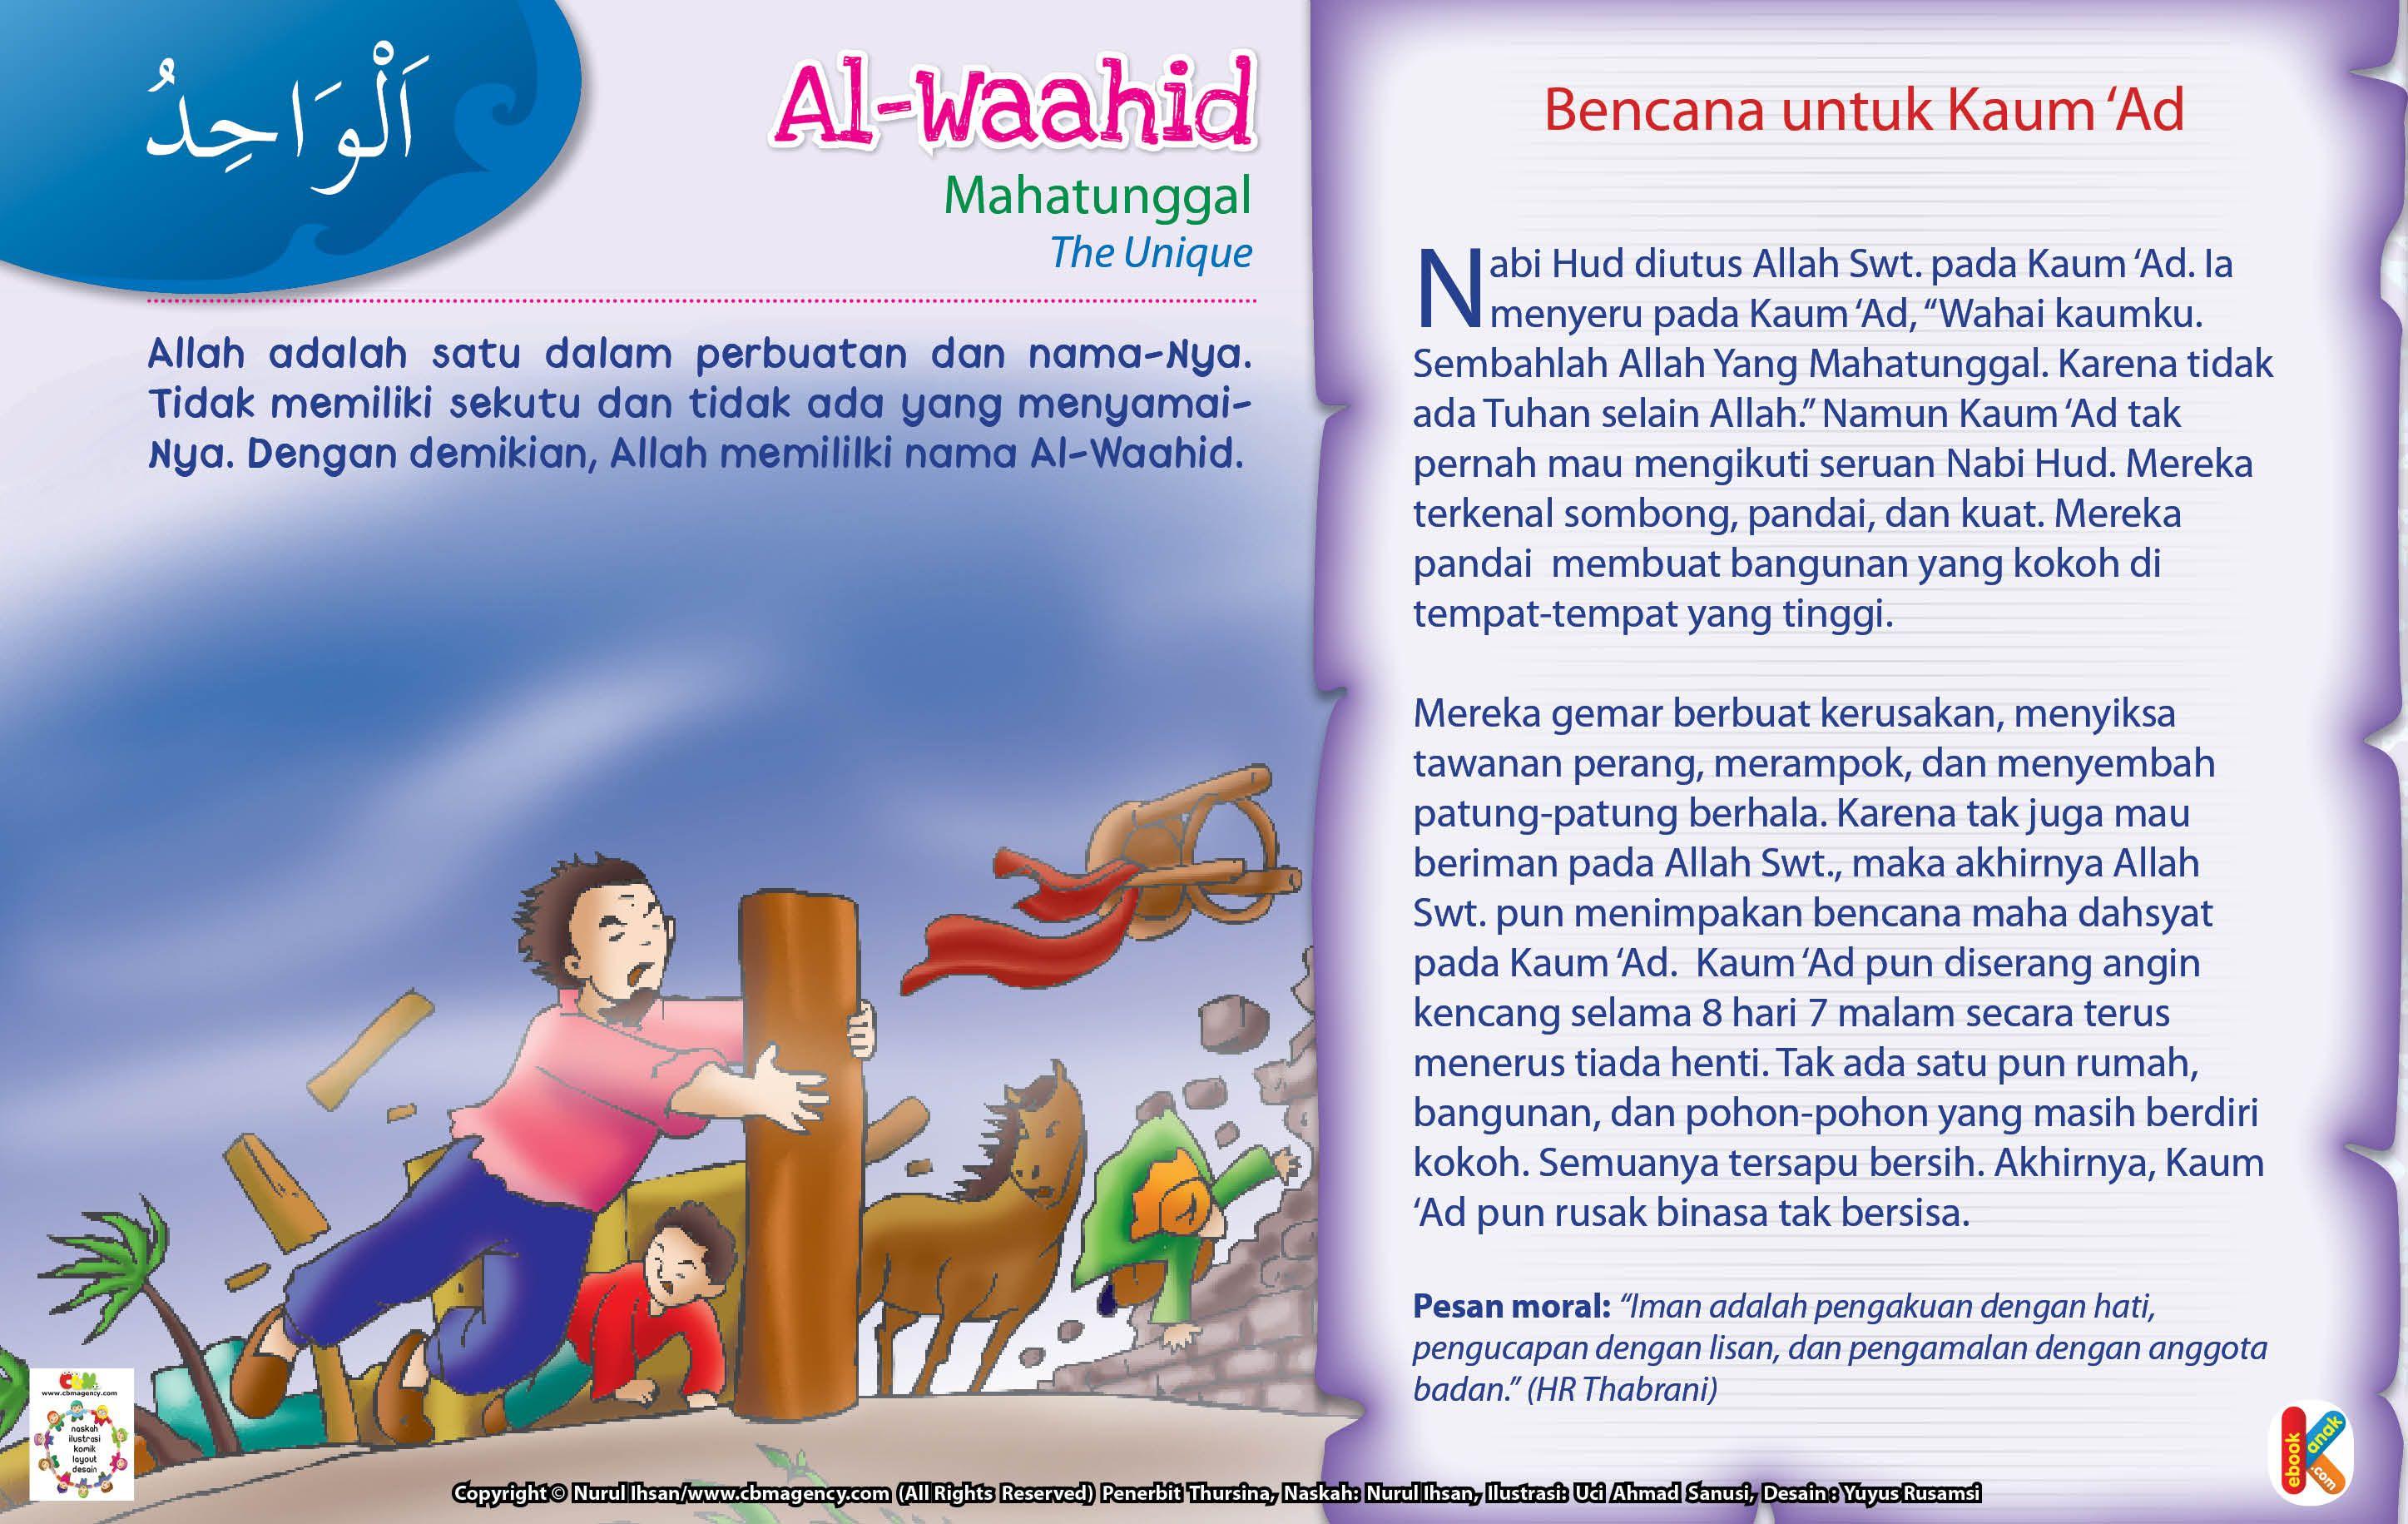 Kisah Asma'ul Husna AlWaahid Pendidikan, Sahabat, Motivasi